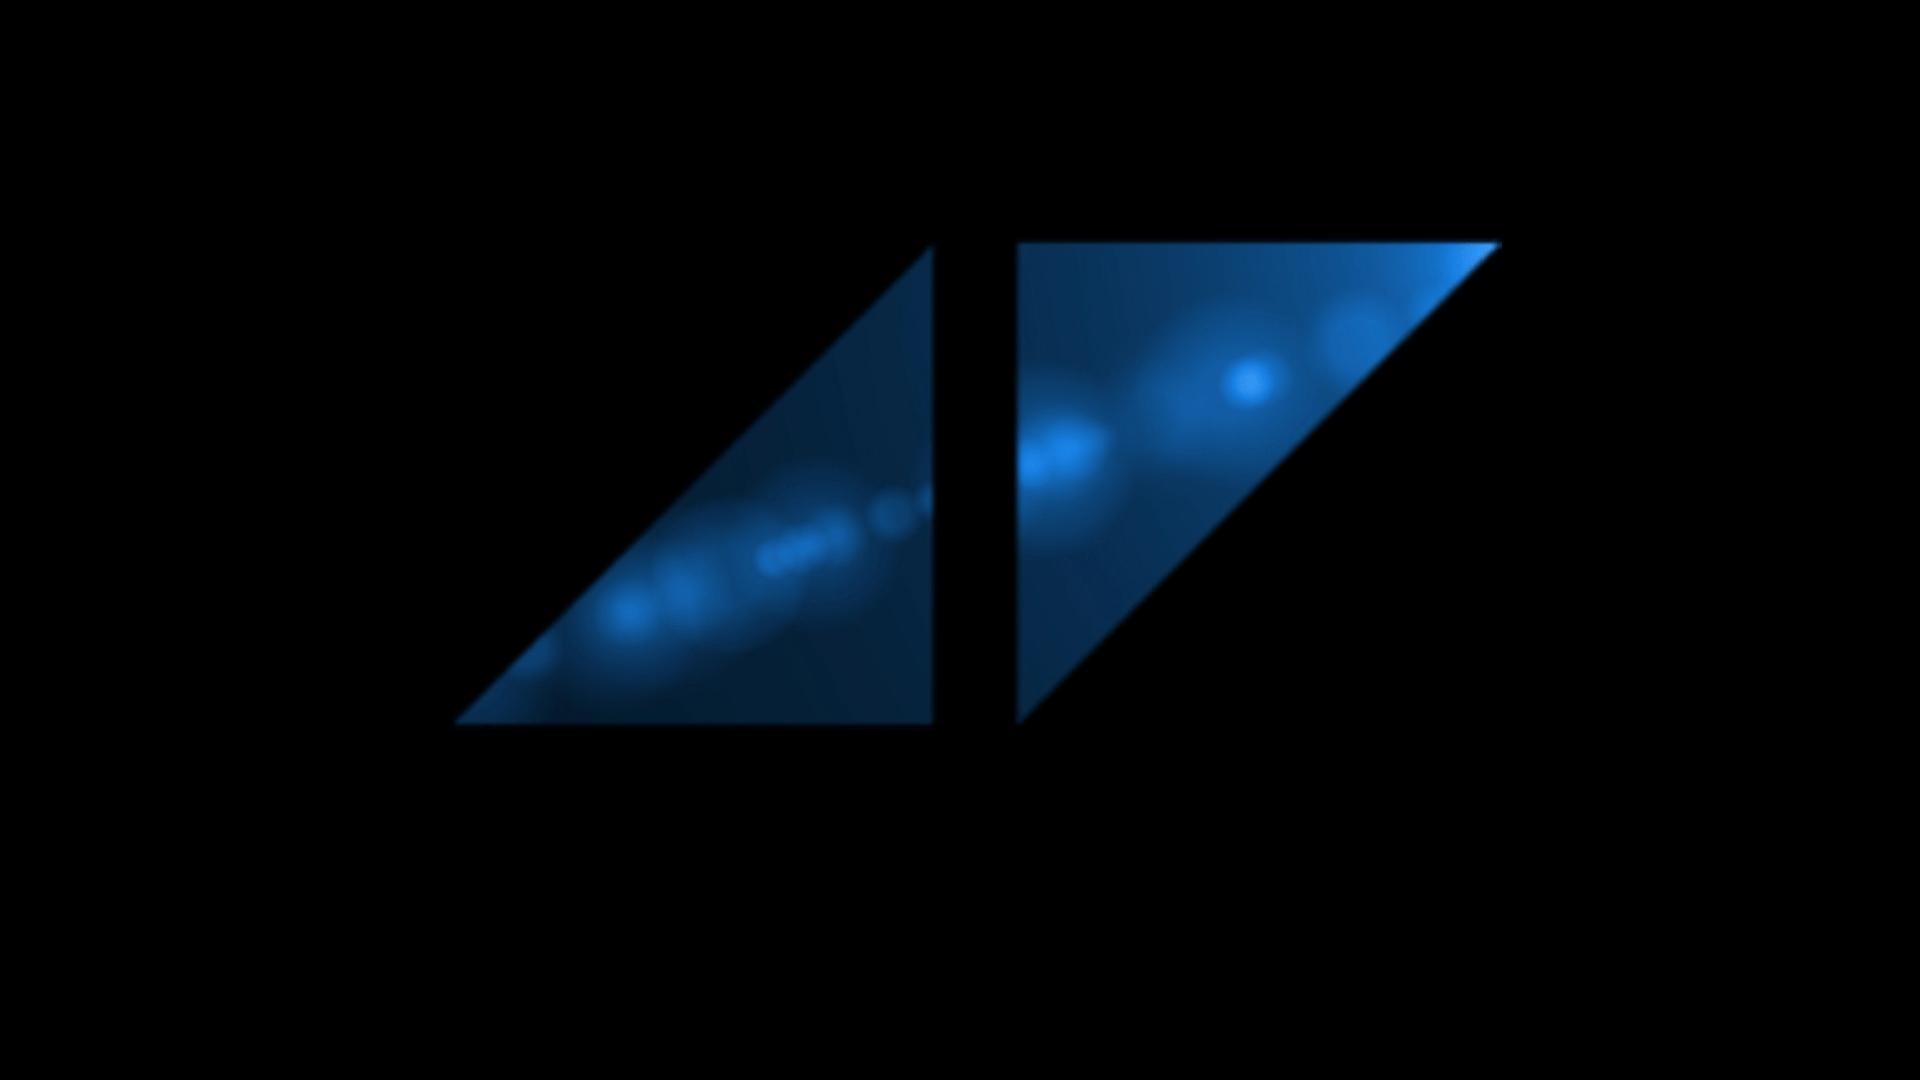 avicii logo wallpapers wallpaper